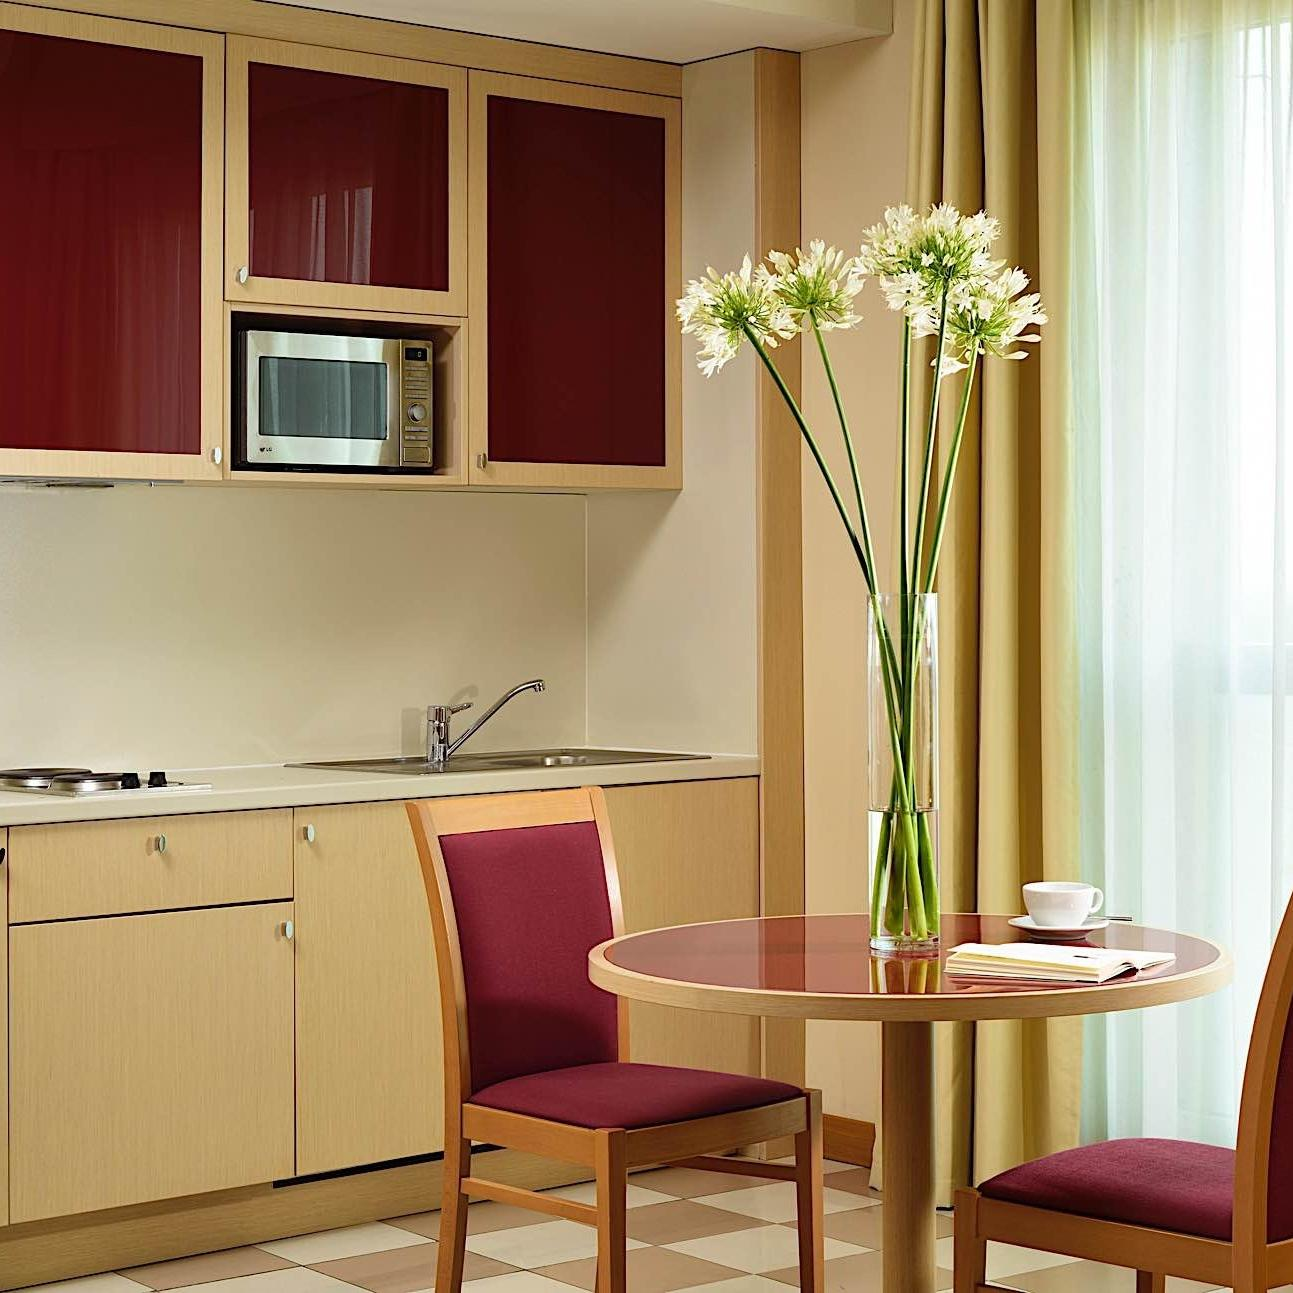 Kitchen | The One Milano